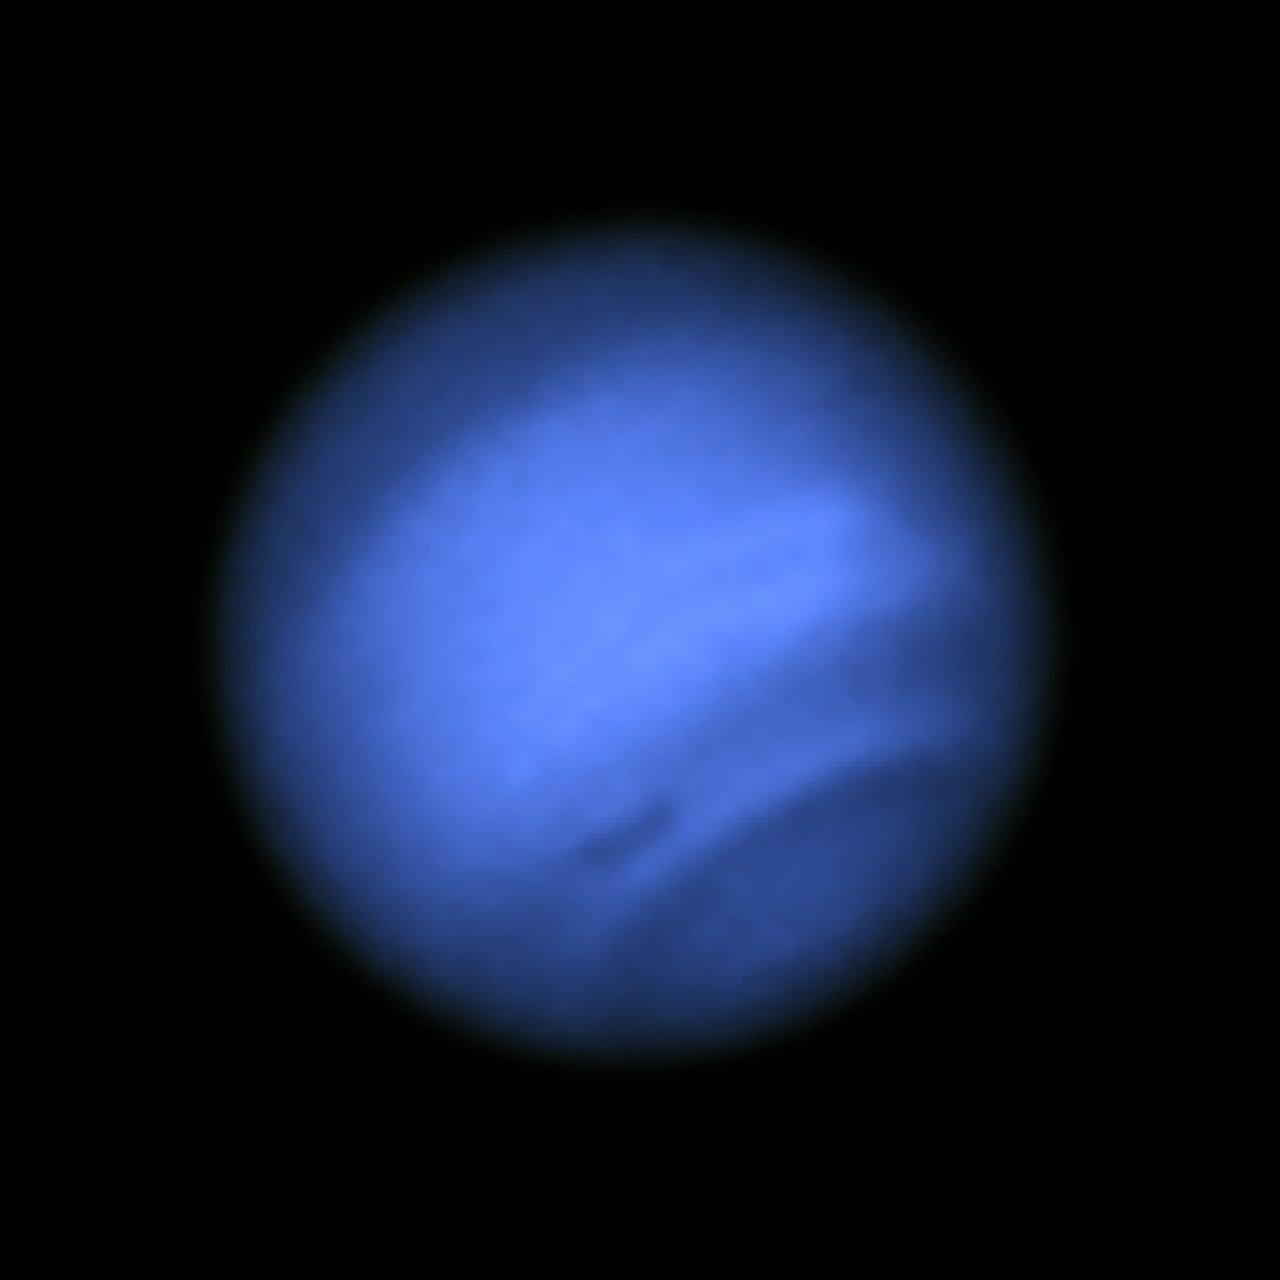 Image with dark spot (blue light)